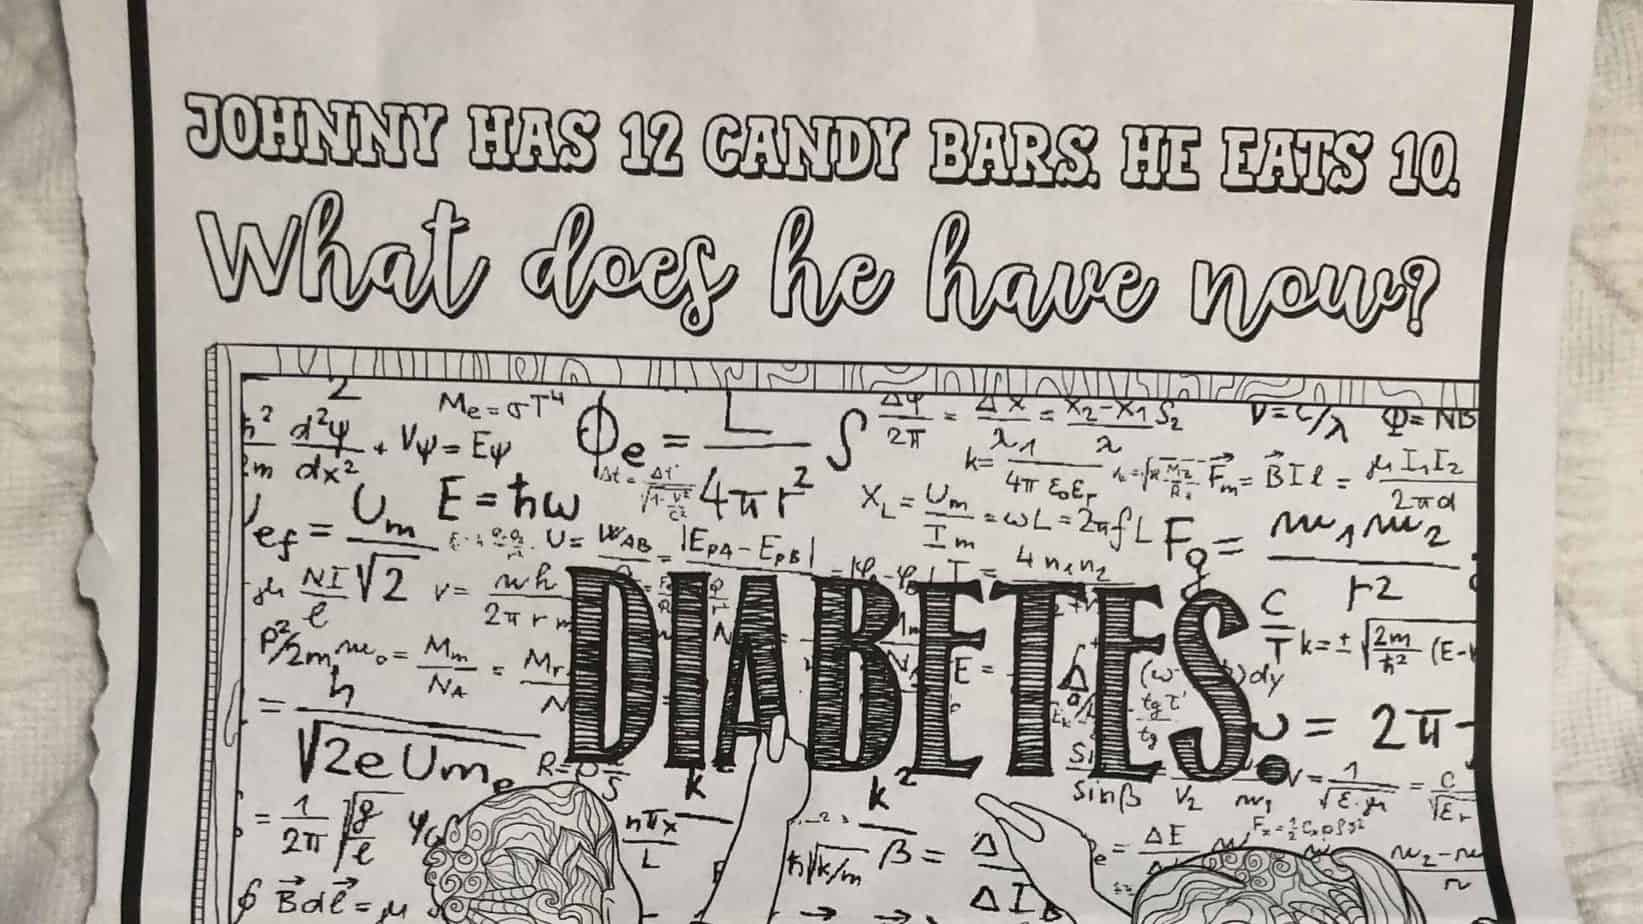 photo of coloring sheet with diabetes joke